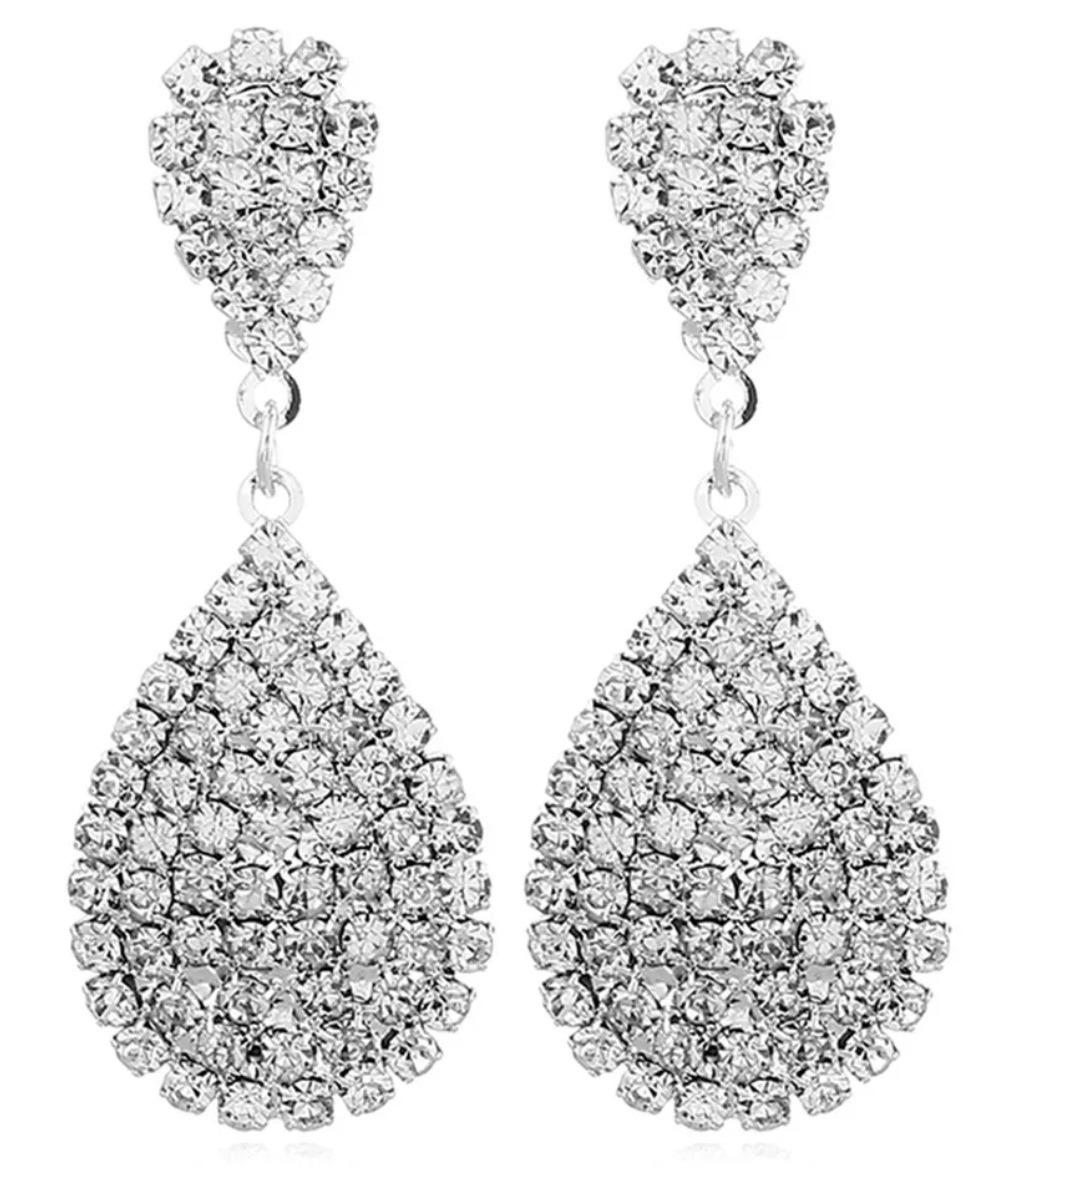 21d07b9c4d0f elegantes aretes largos gota cristal zirconia baño de plata. Cargando zoom.